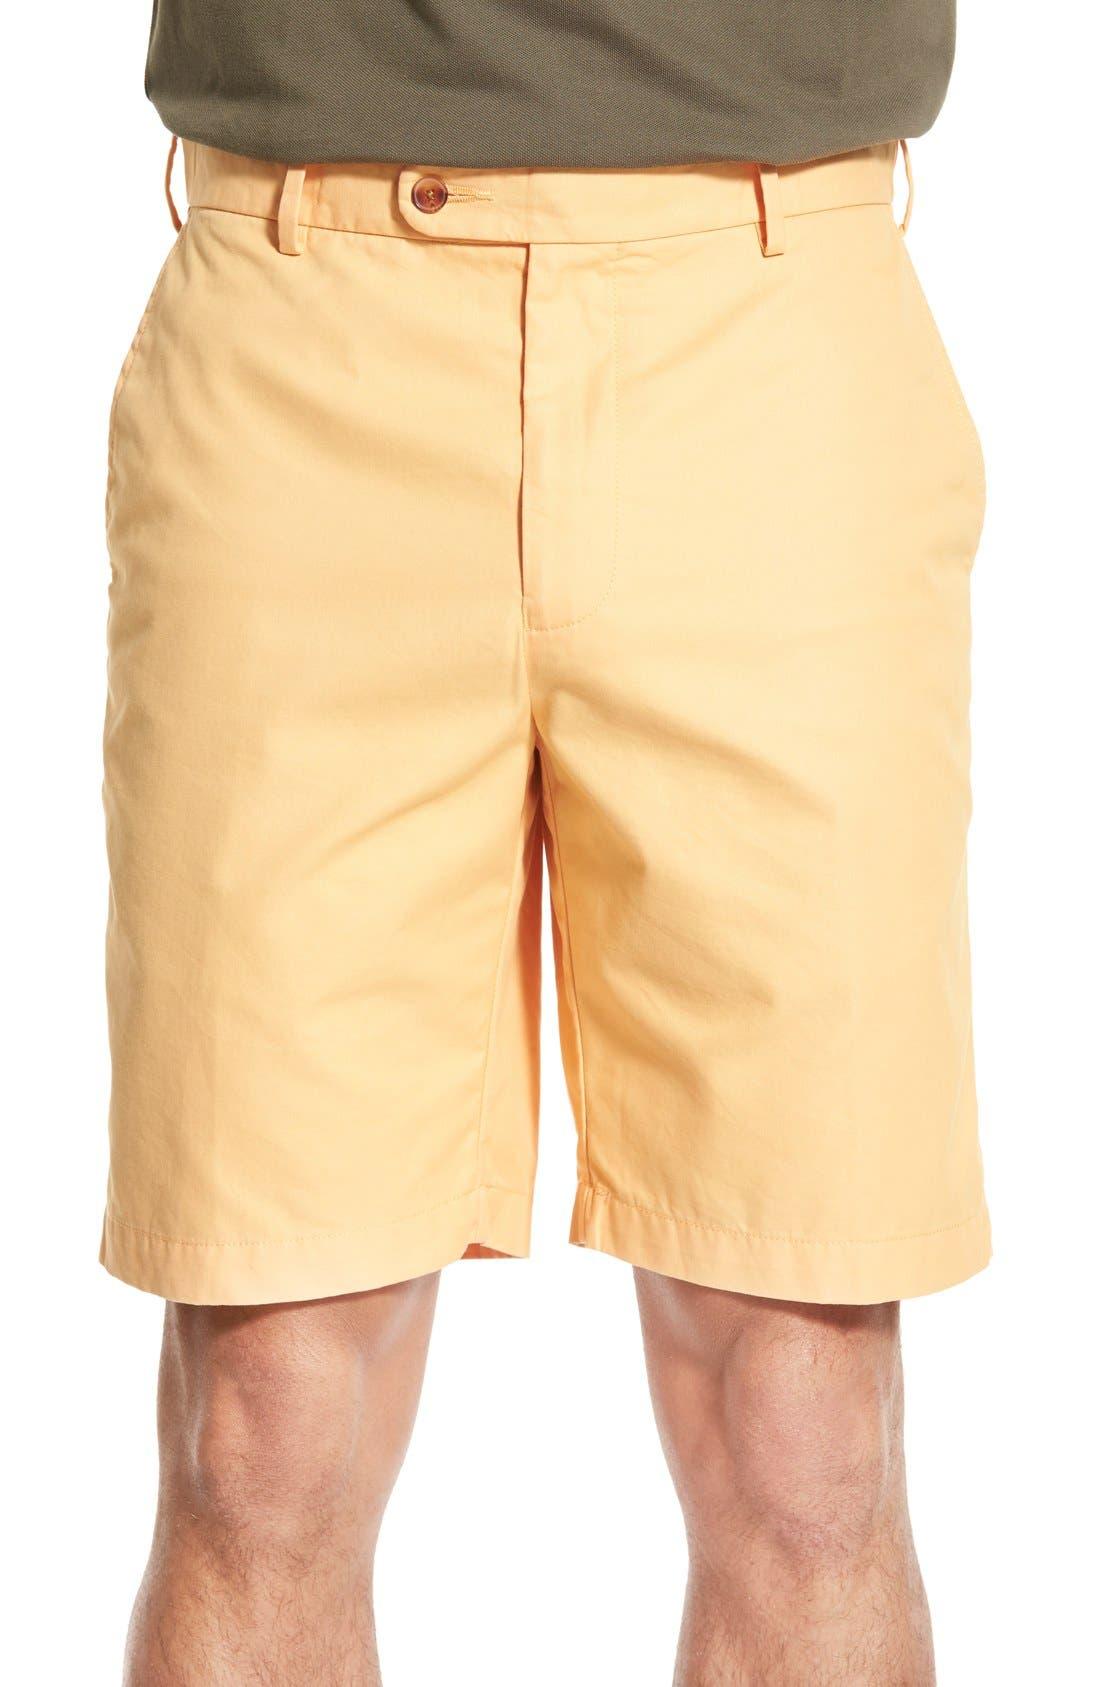 Alternate Image 1 Selected - Peter Millar Pima Cotton Twill Shorts